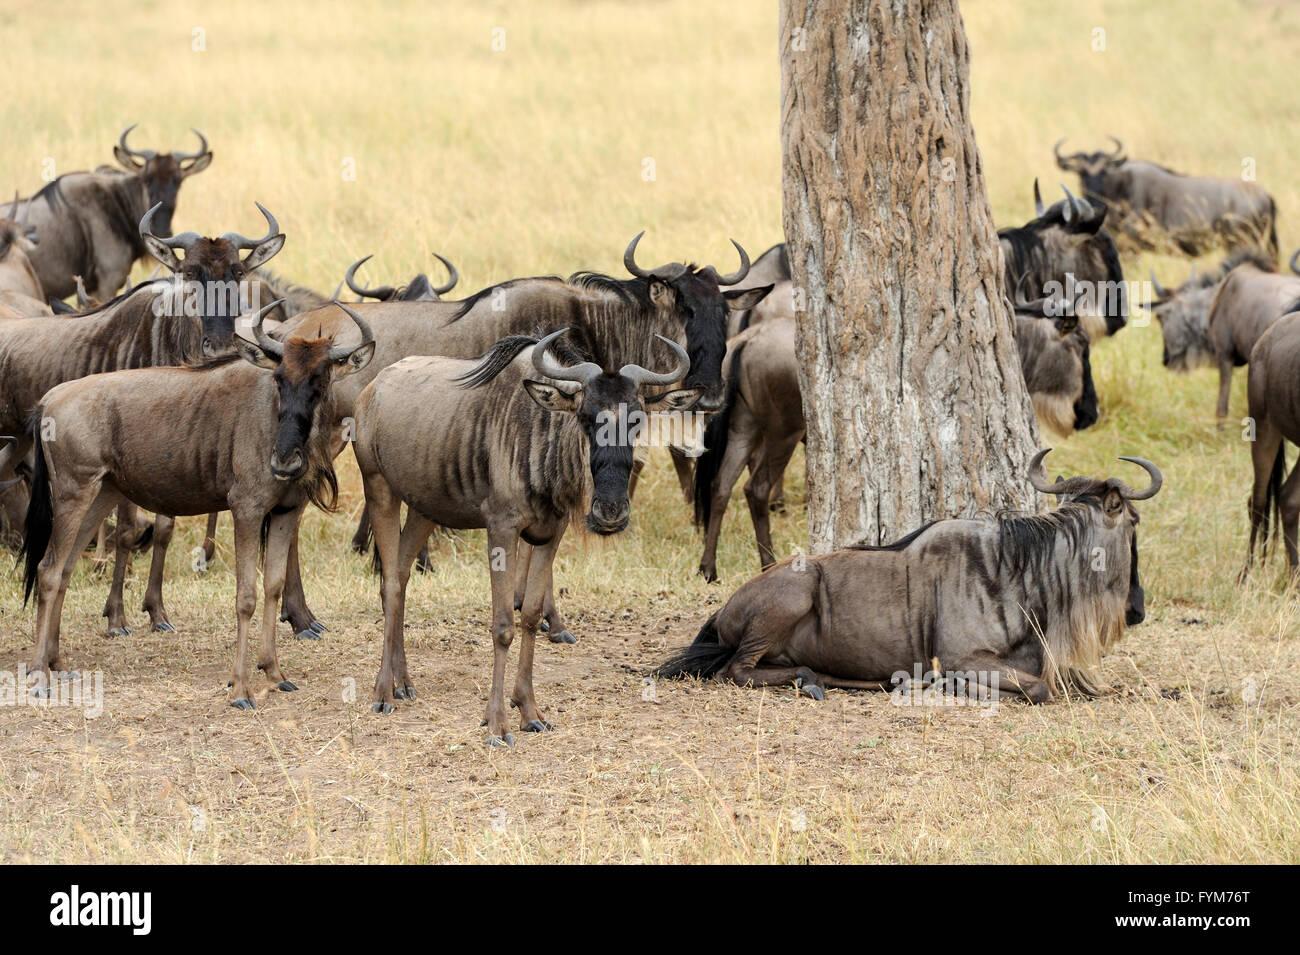 Wildebeest in National park of Kenya, Africa Stock Photo